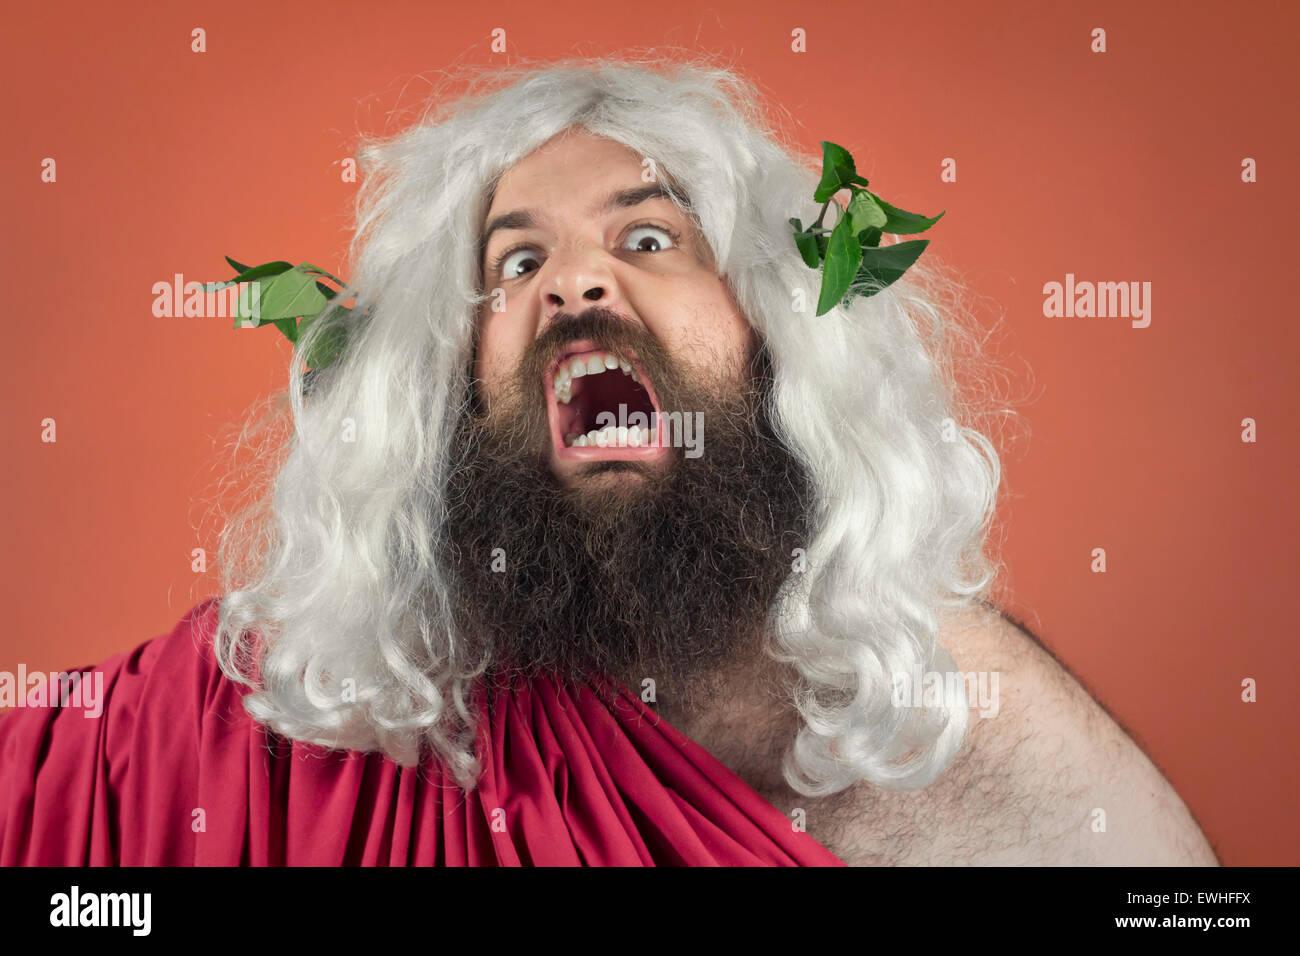 Angry screaming wrath of god against orange background - Stock Image